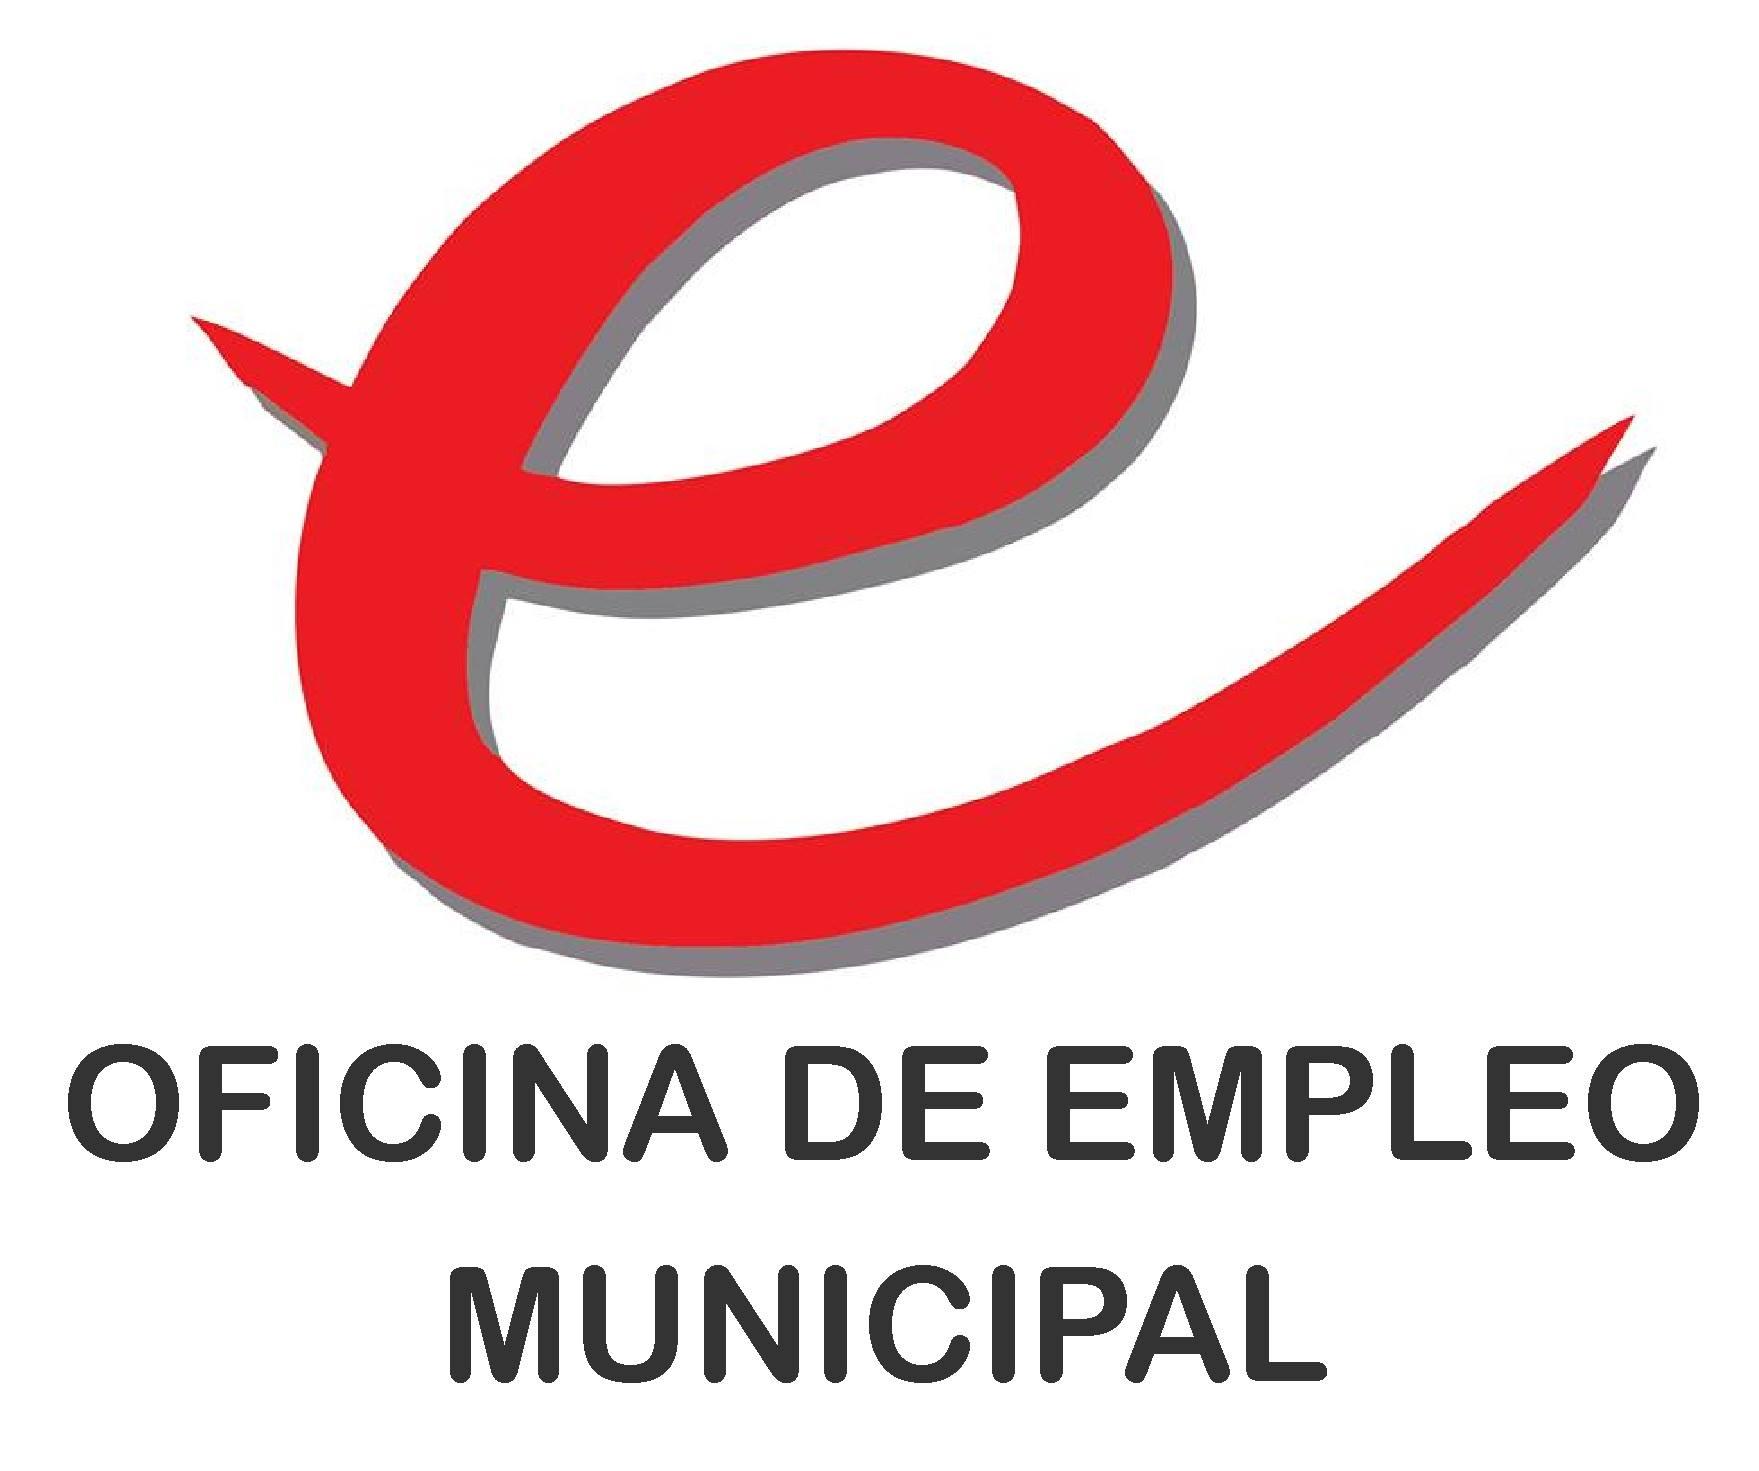 La oficina de empleo municipal informa sobre importante for Oficina de empleo de segovia